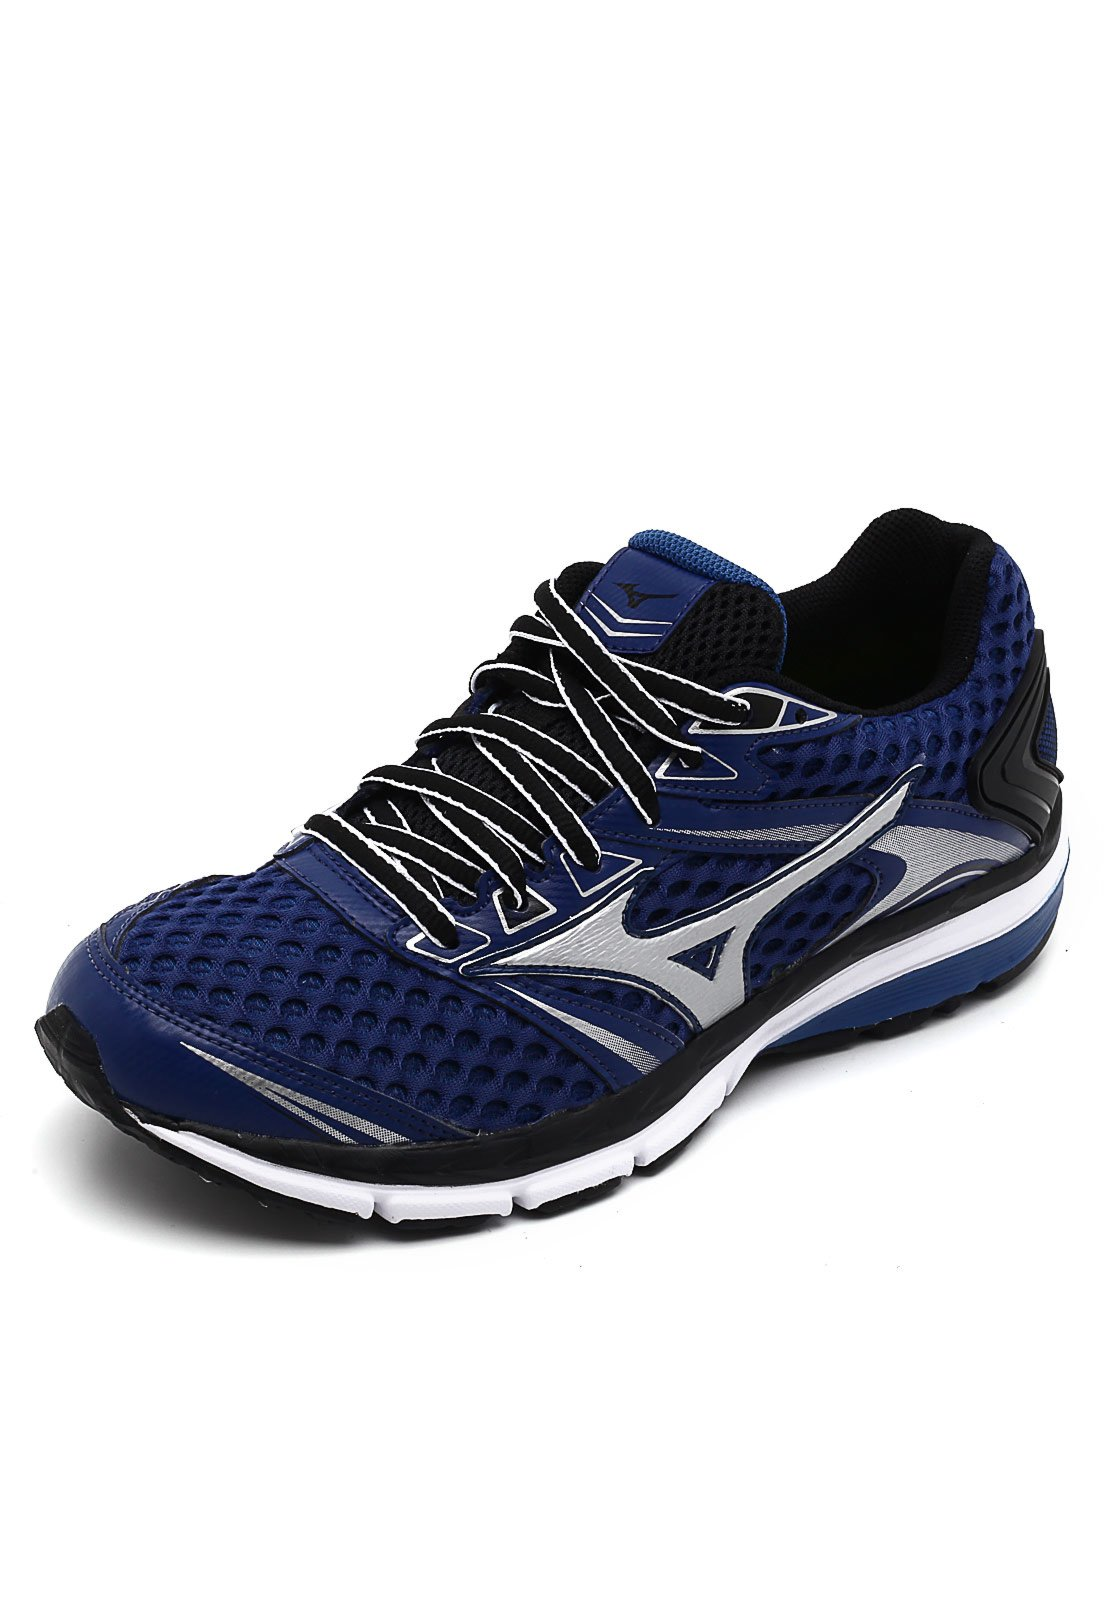 mizuno shoes for walking everyday zurich 02 new